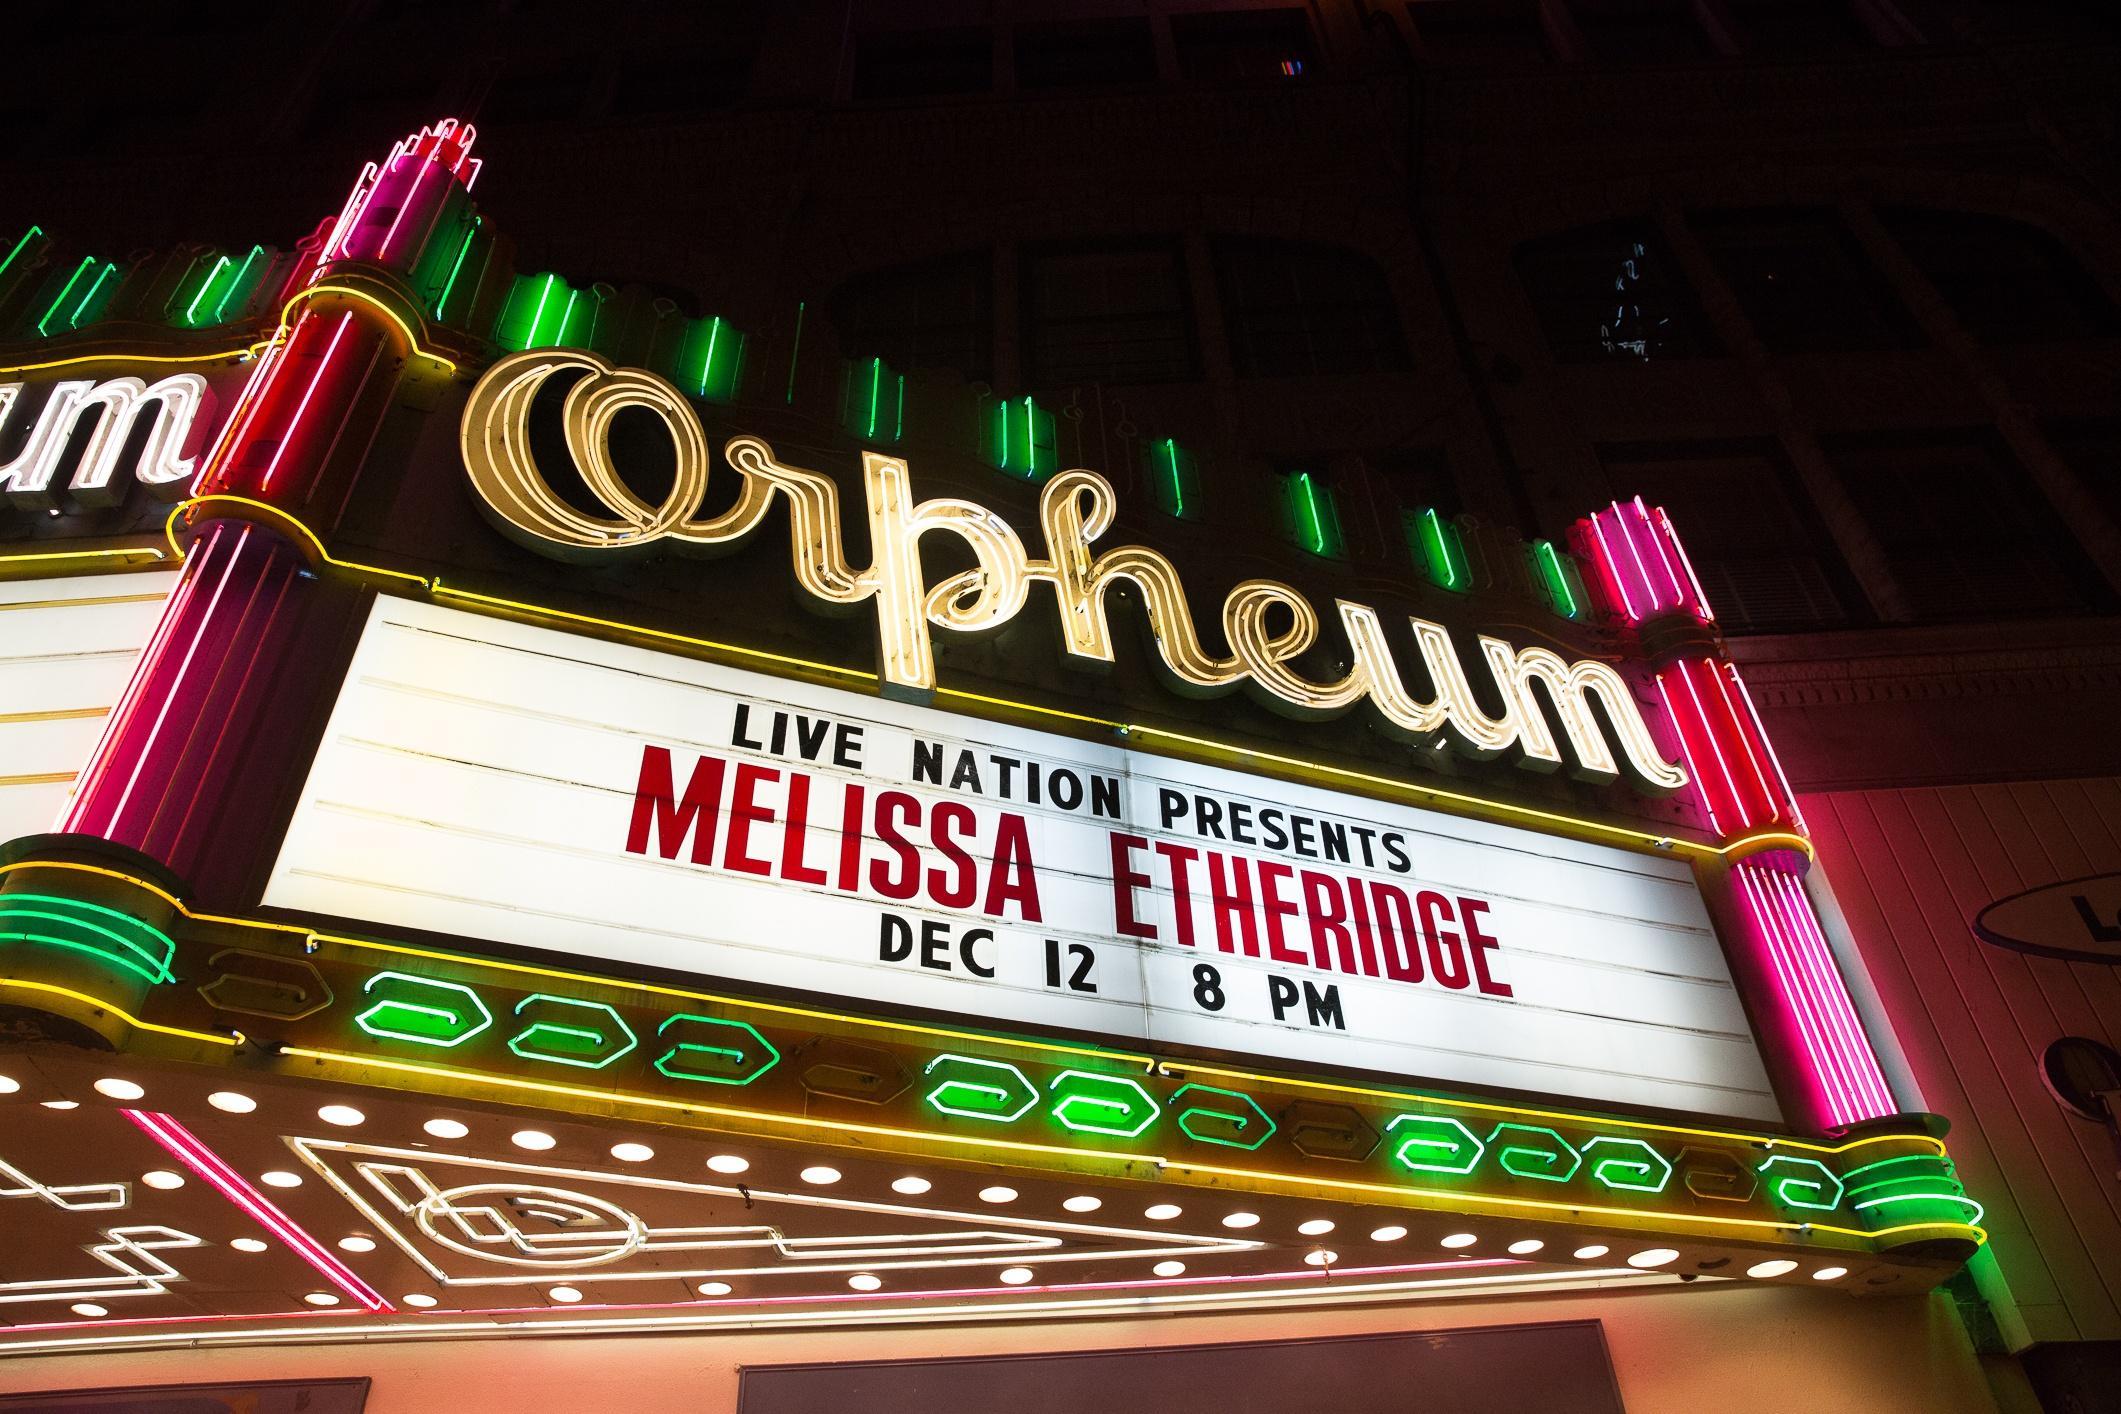 Melissa Etheridge Live at the Orpheum